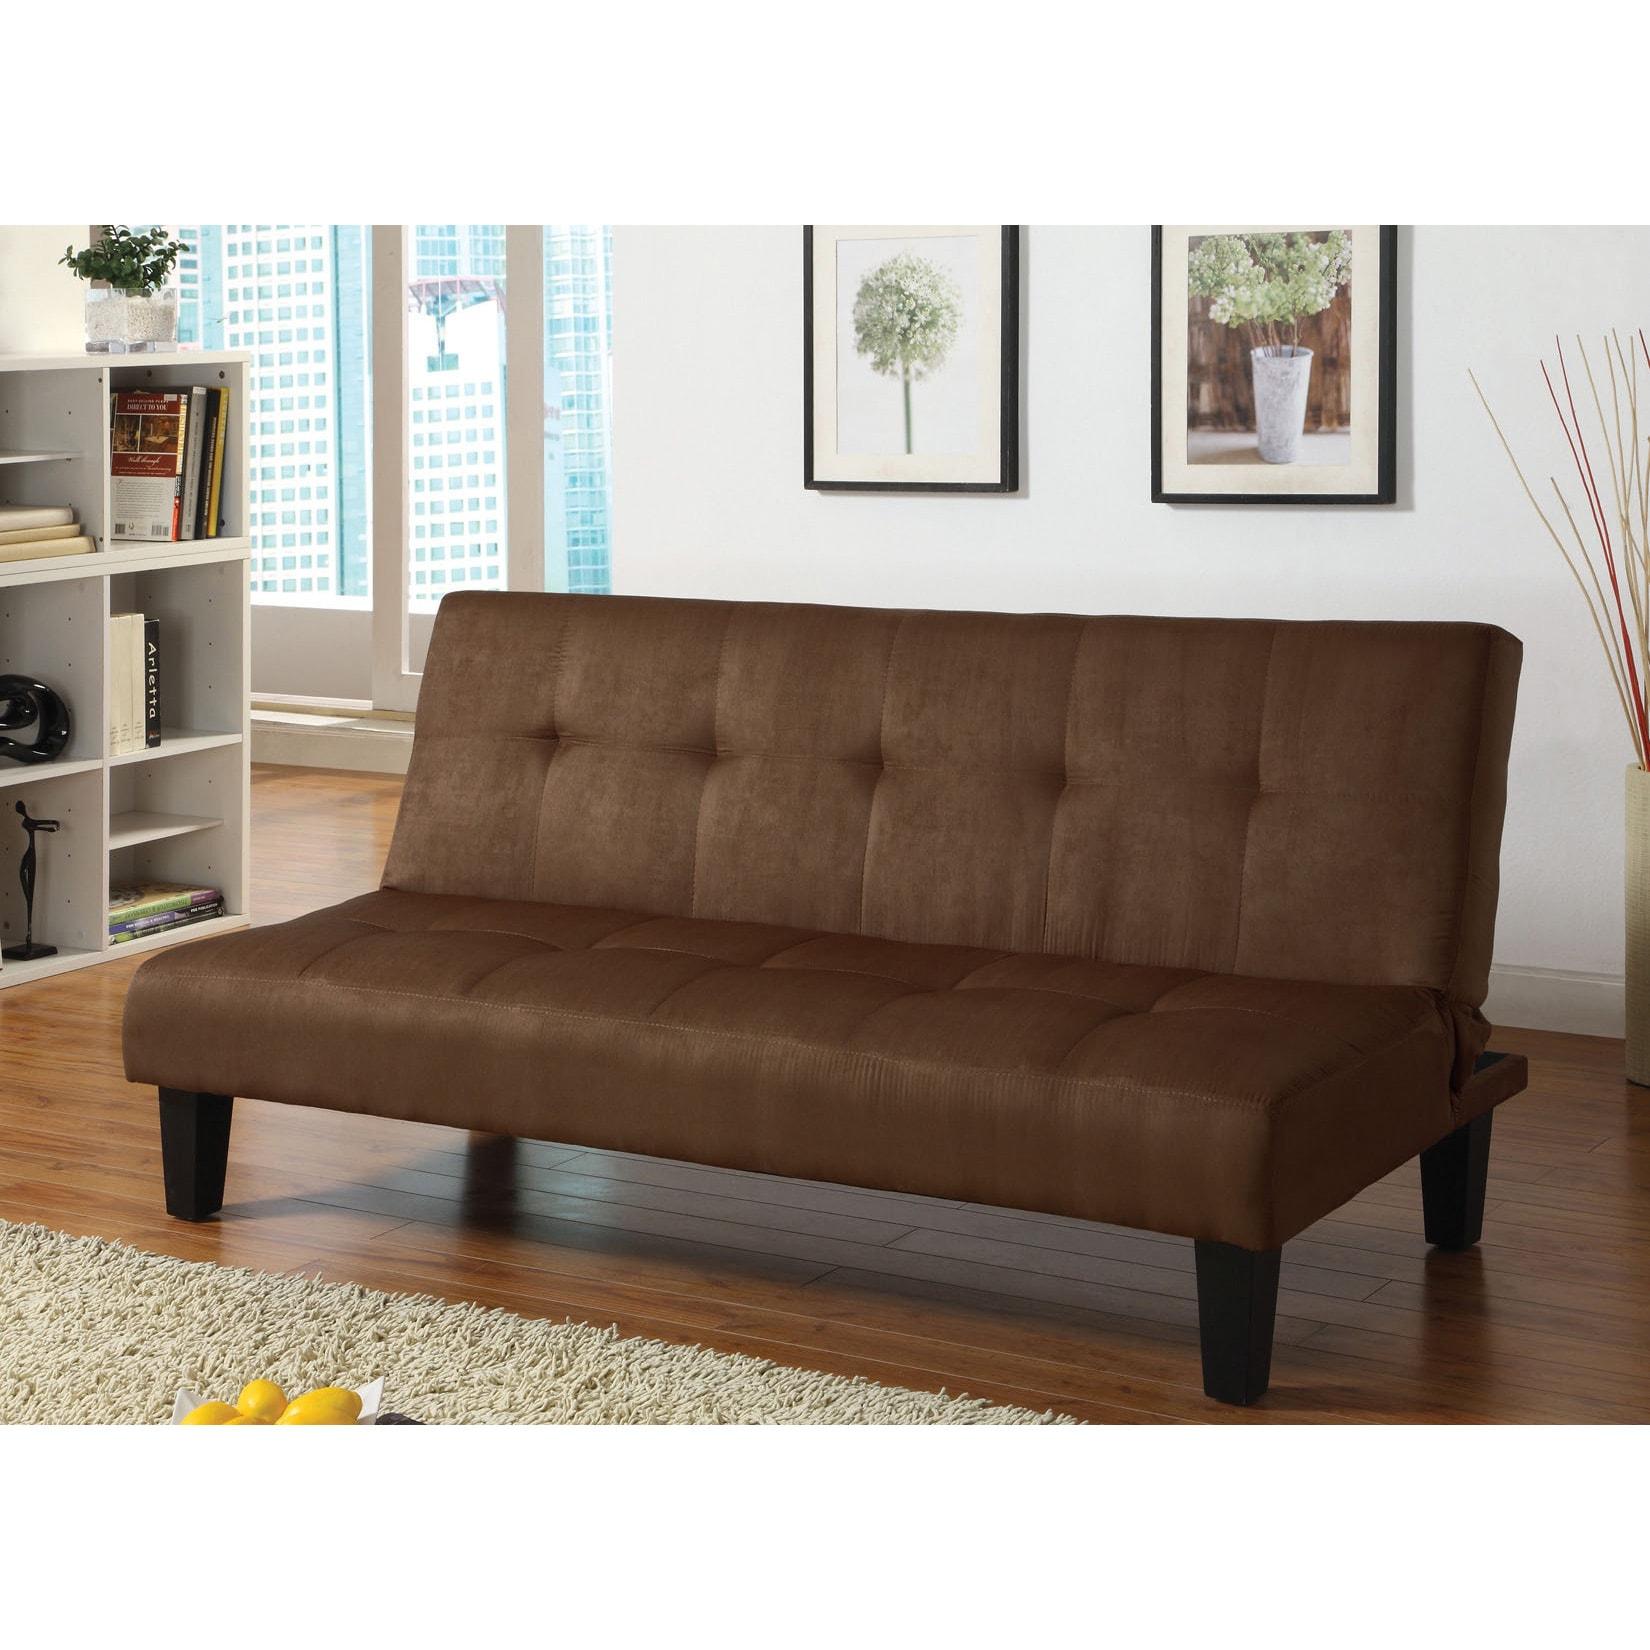 ACME Emmet Chocolate Microfiber Adjustable Sofa (Chocolat...